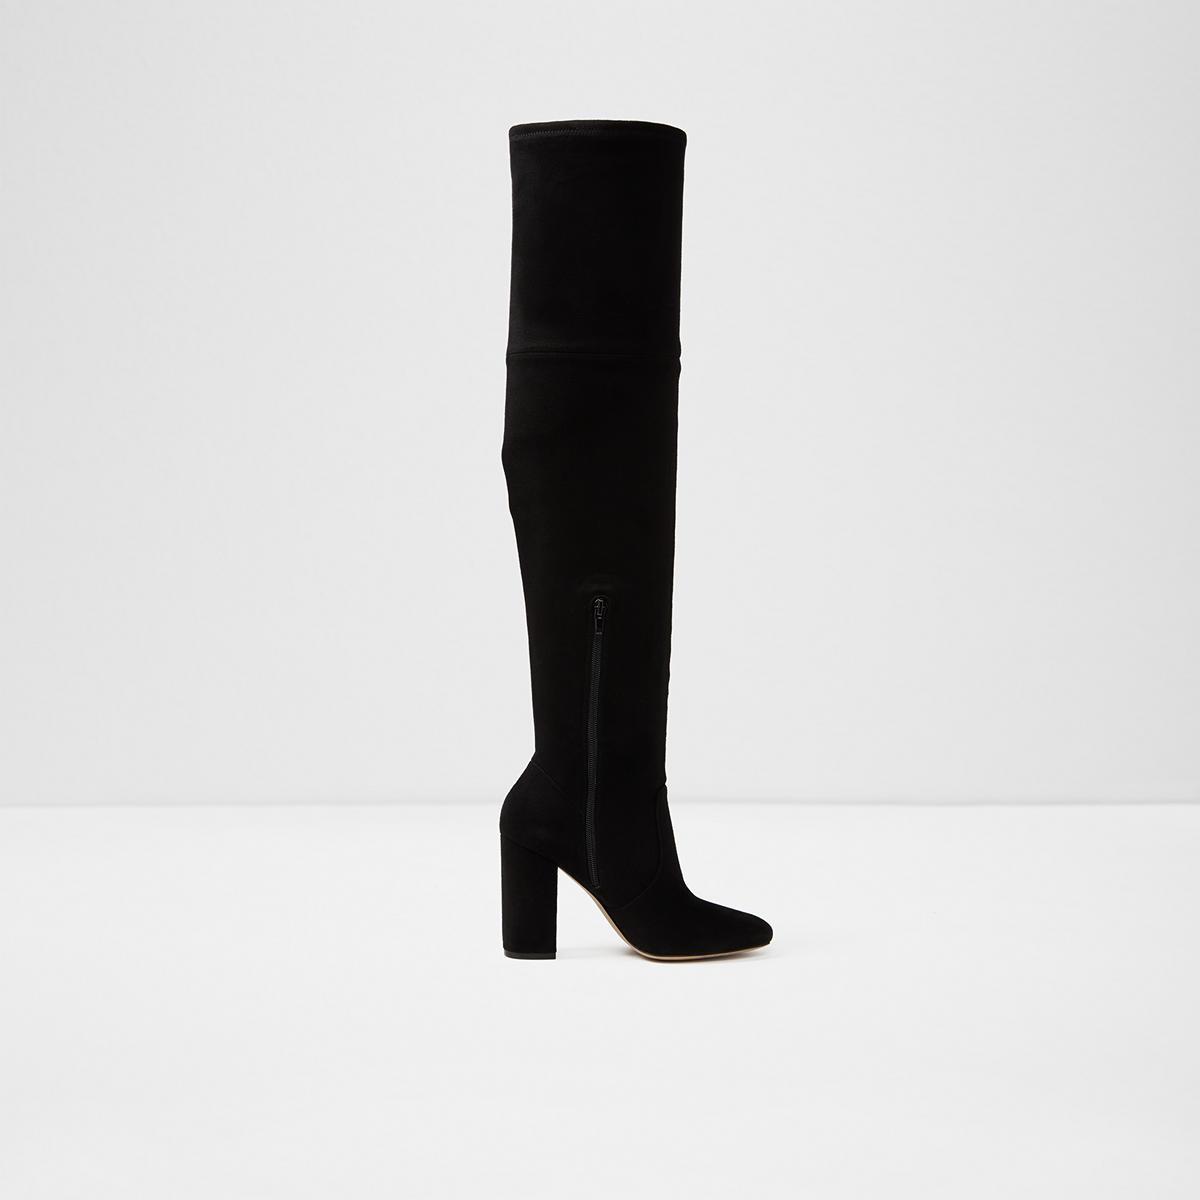 18e46a6da1d Maede Midnight Black Women s Over-the-knee boots